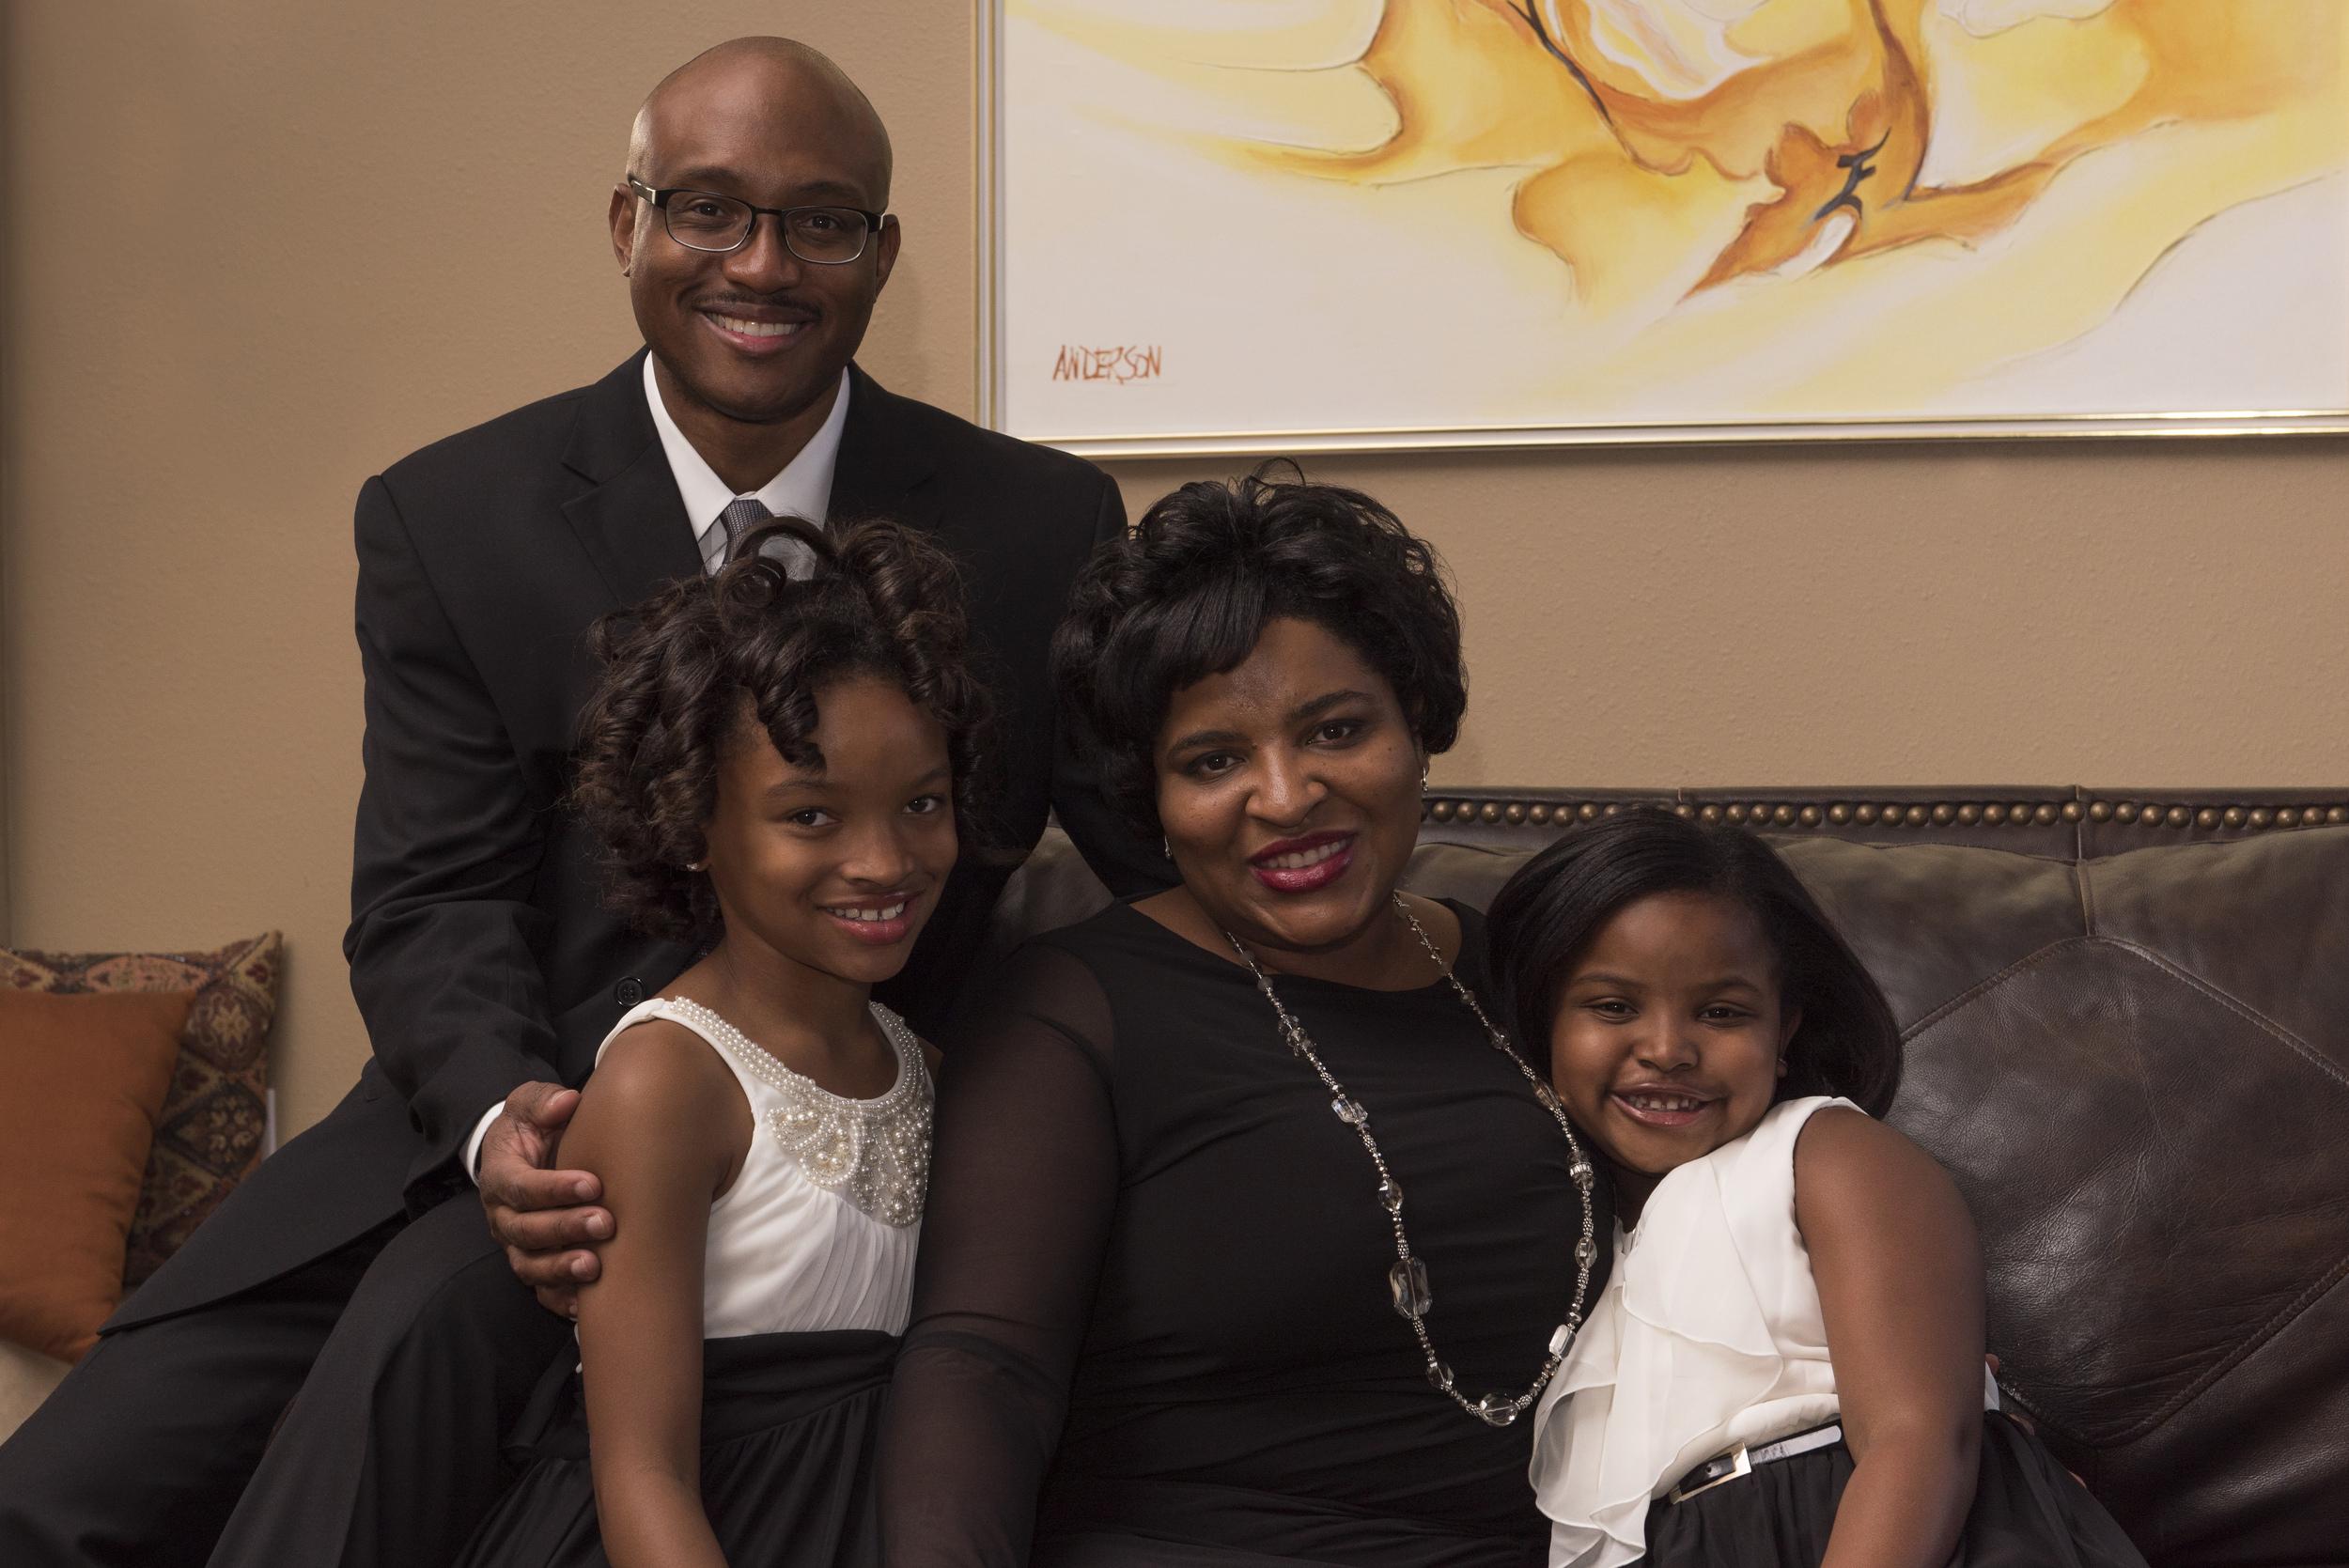 Albuquerque Family Photographer Brundage Family copyright Phillip Banks 2014 (3).jpg